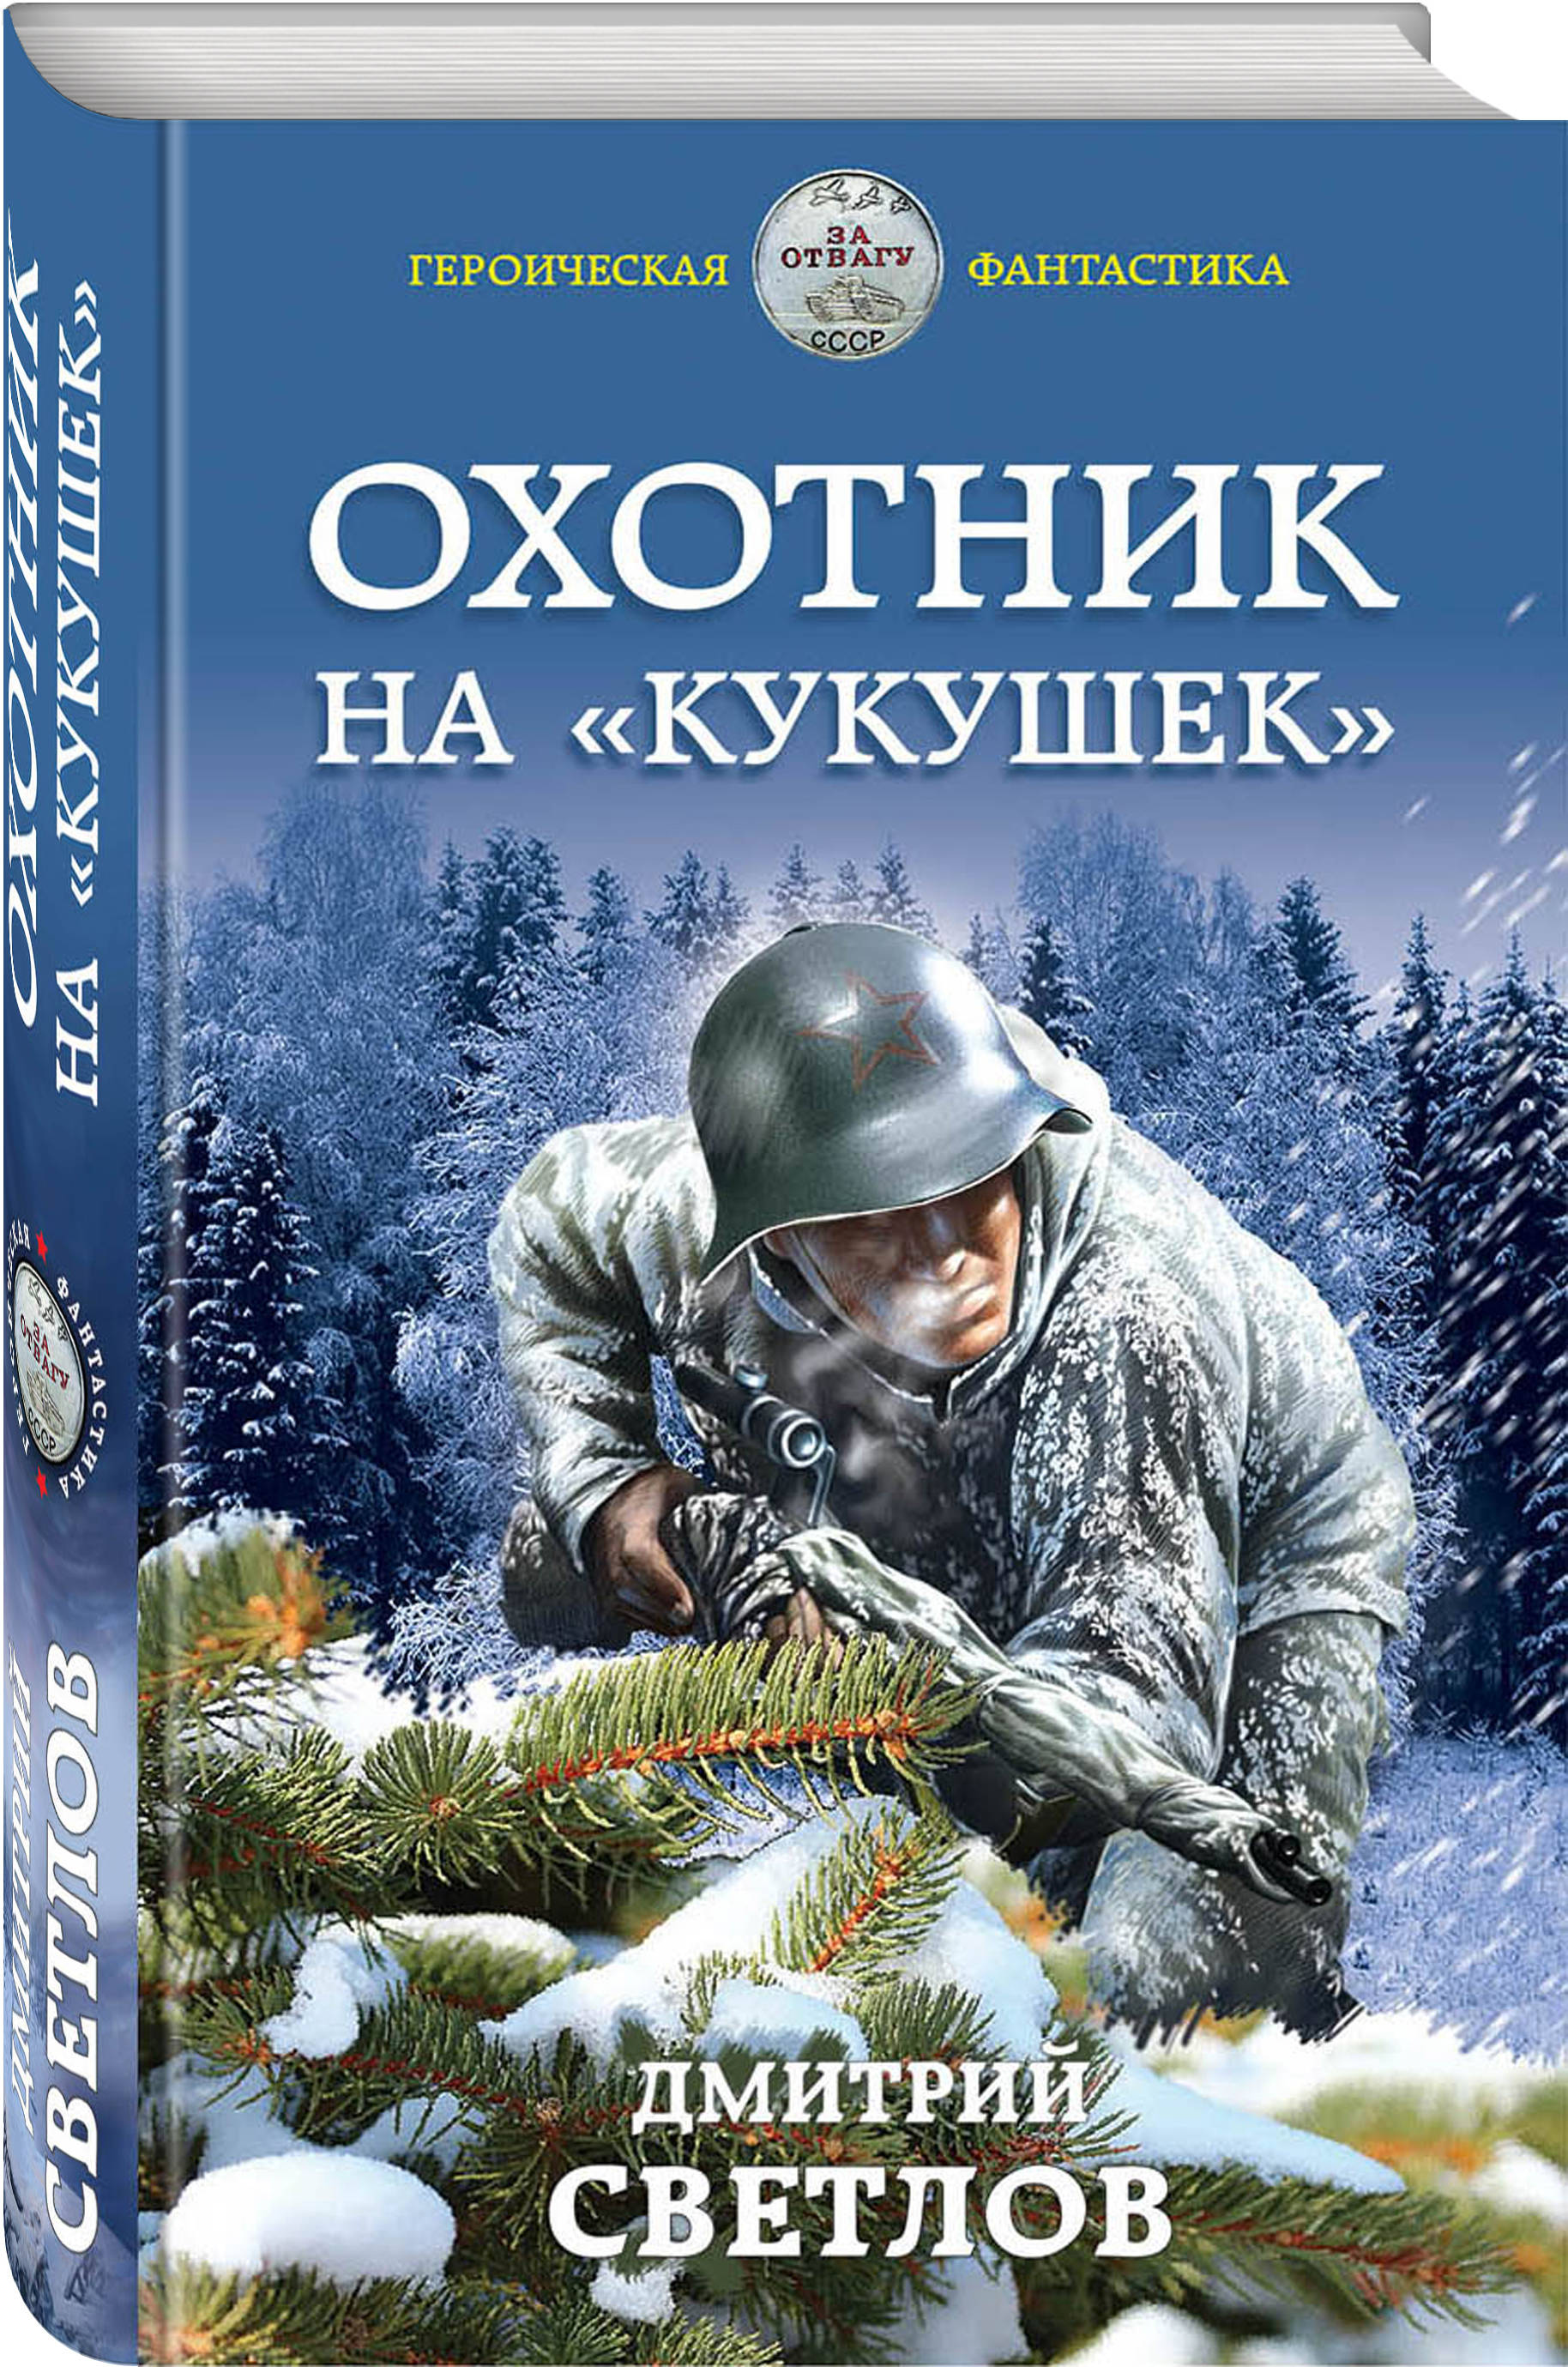 Светлов Дмитрий Николаевич Охотник на «кукушек»